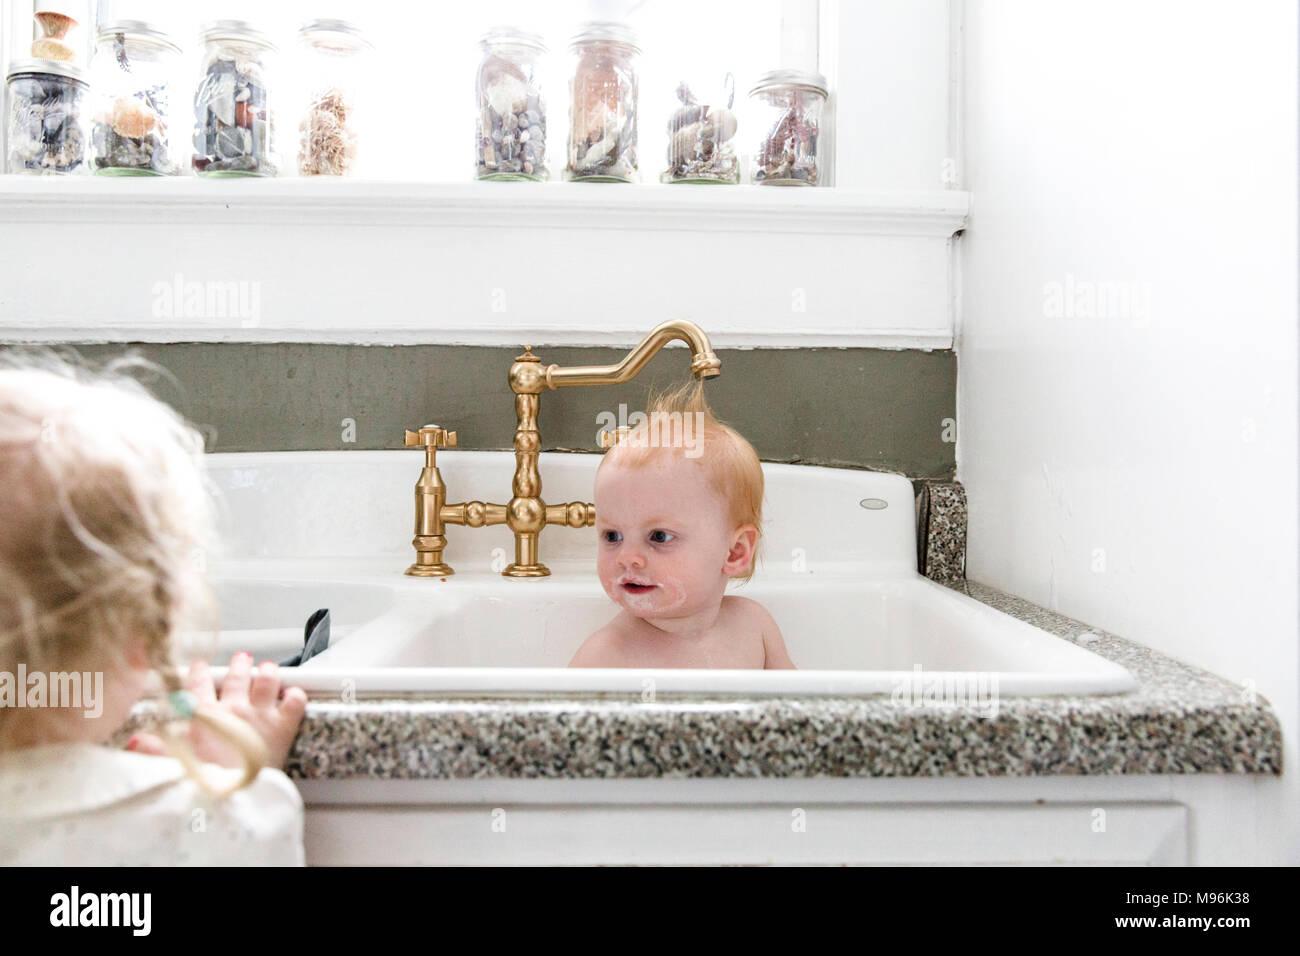 Baby having bath in sink Stock Photo: 177782284 - Alamy